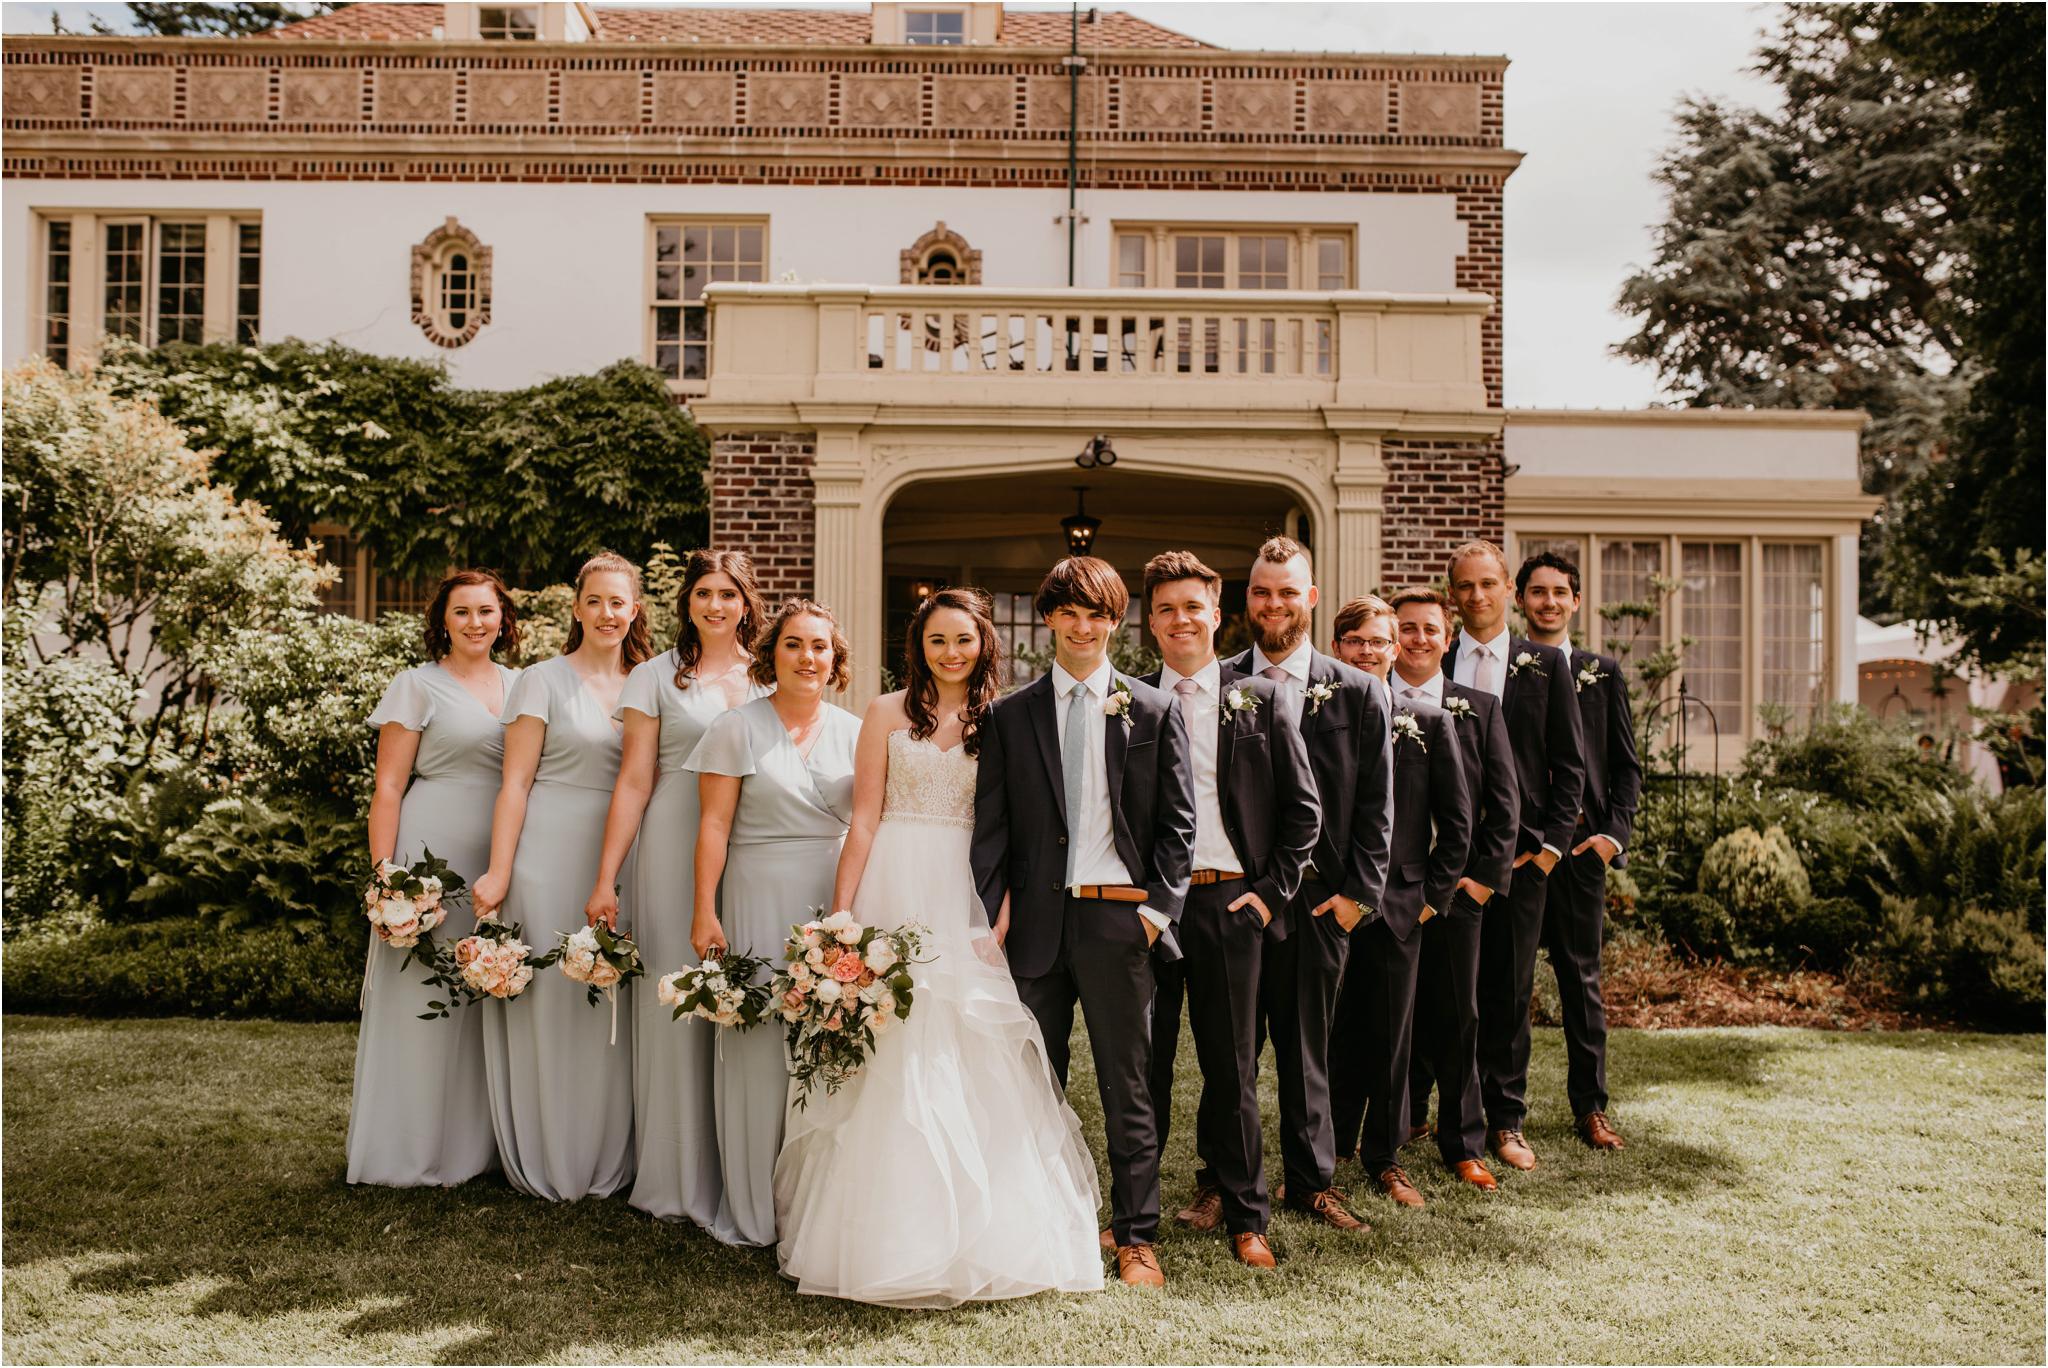 chance-and-ondrea-lairmont-manor-wedding-seattle-photographer-056.jpg